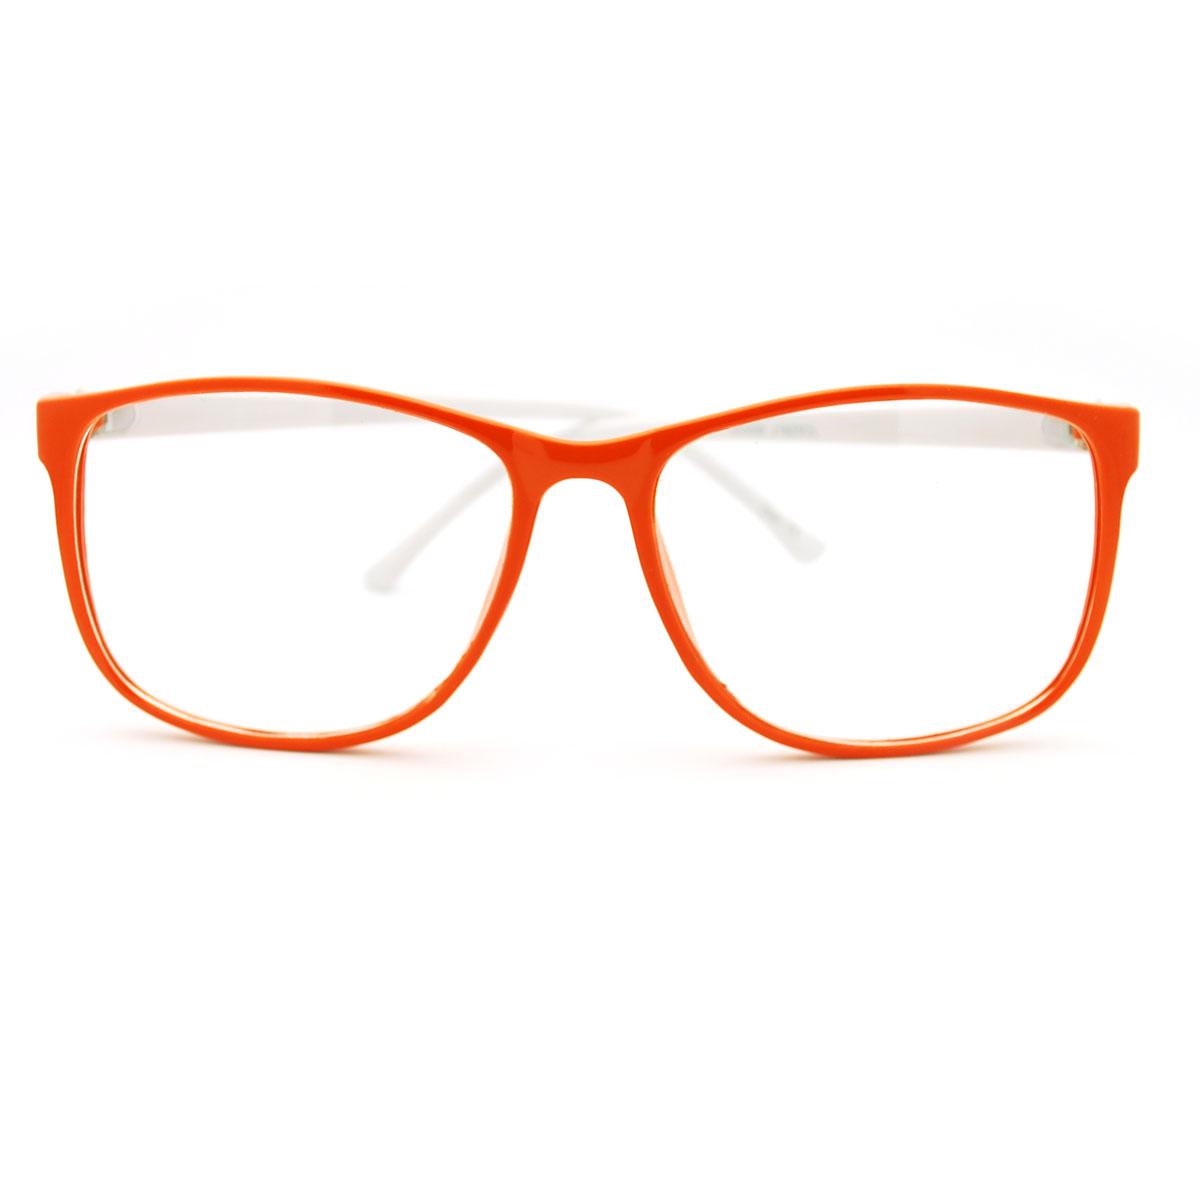 Big Plastic Frame Glasses : Retro Style nerdy Thin Plastic Frame Large Rectangular ...